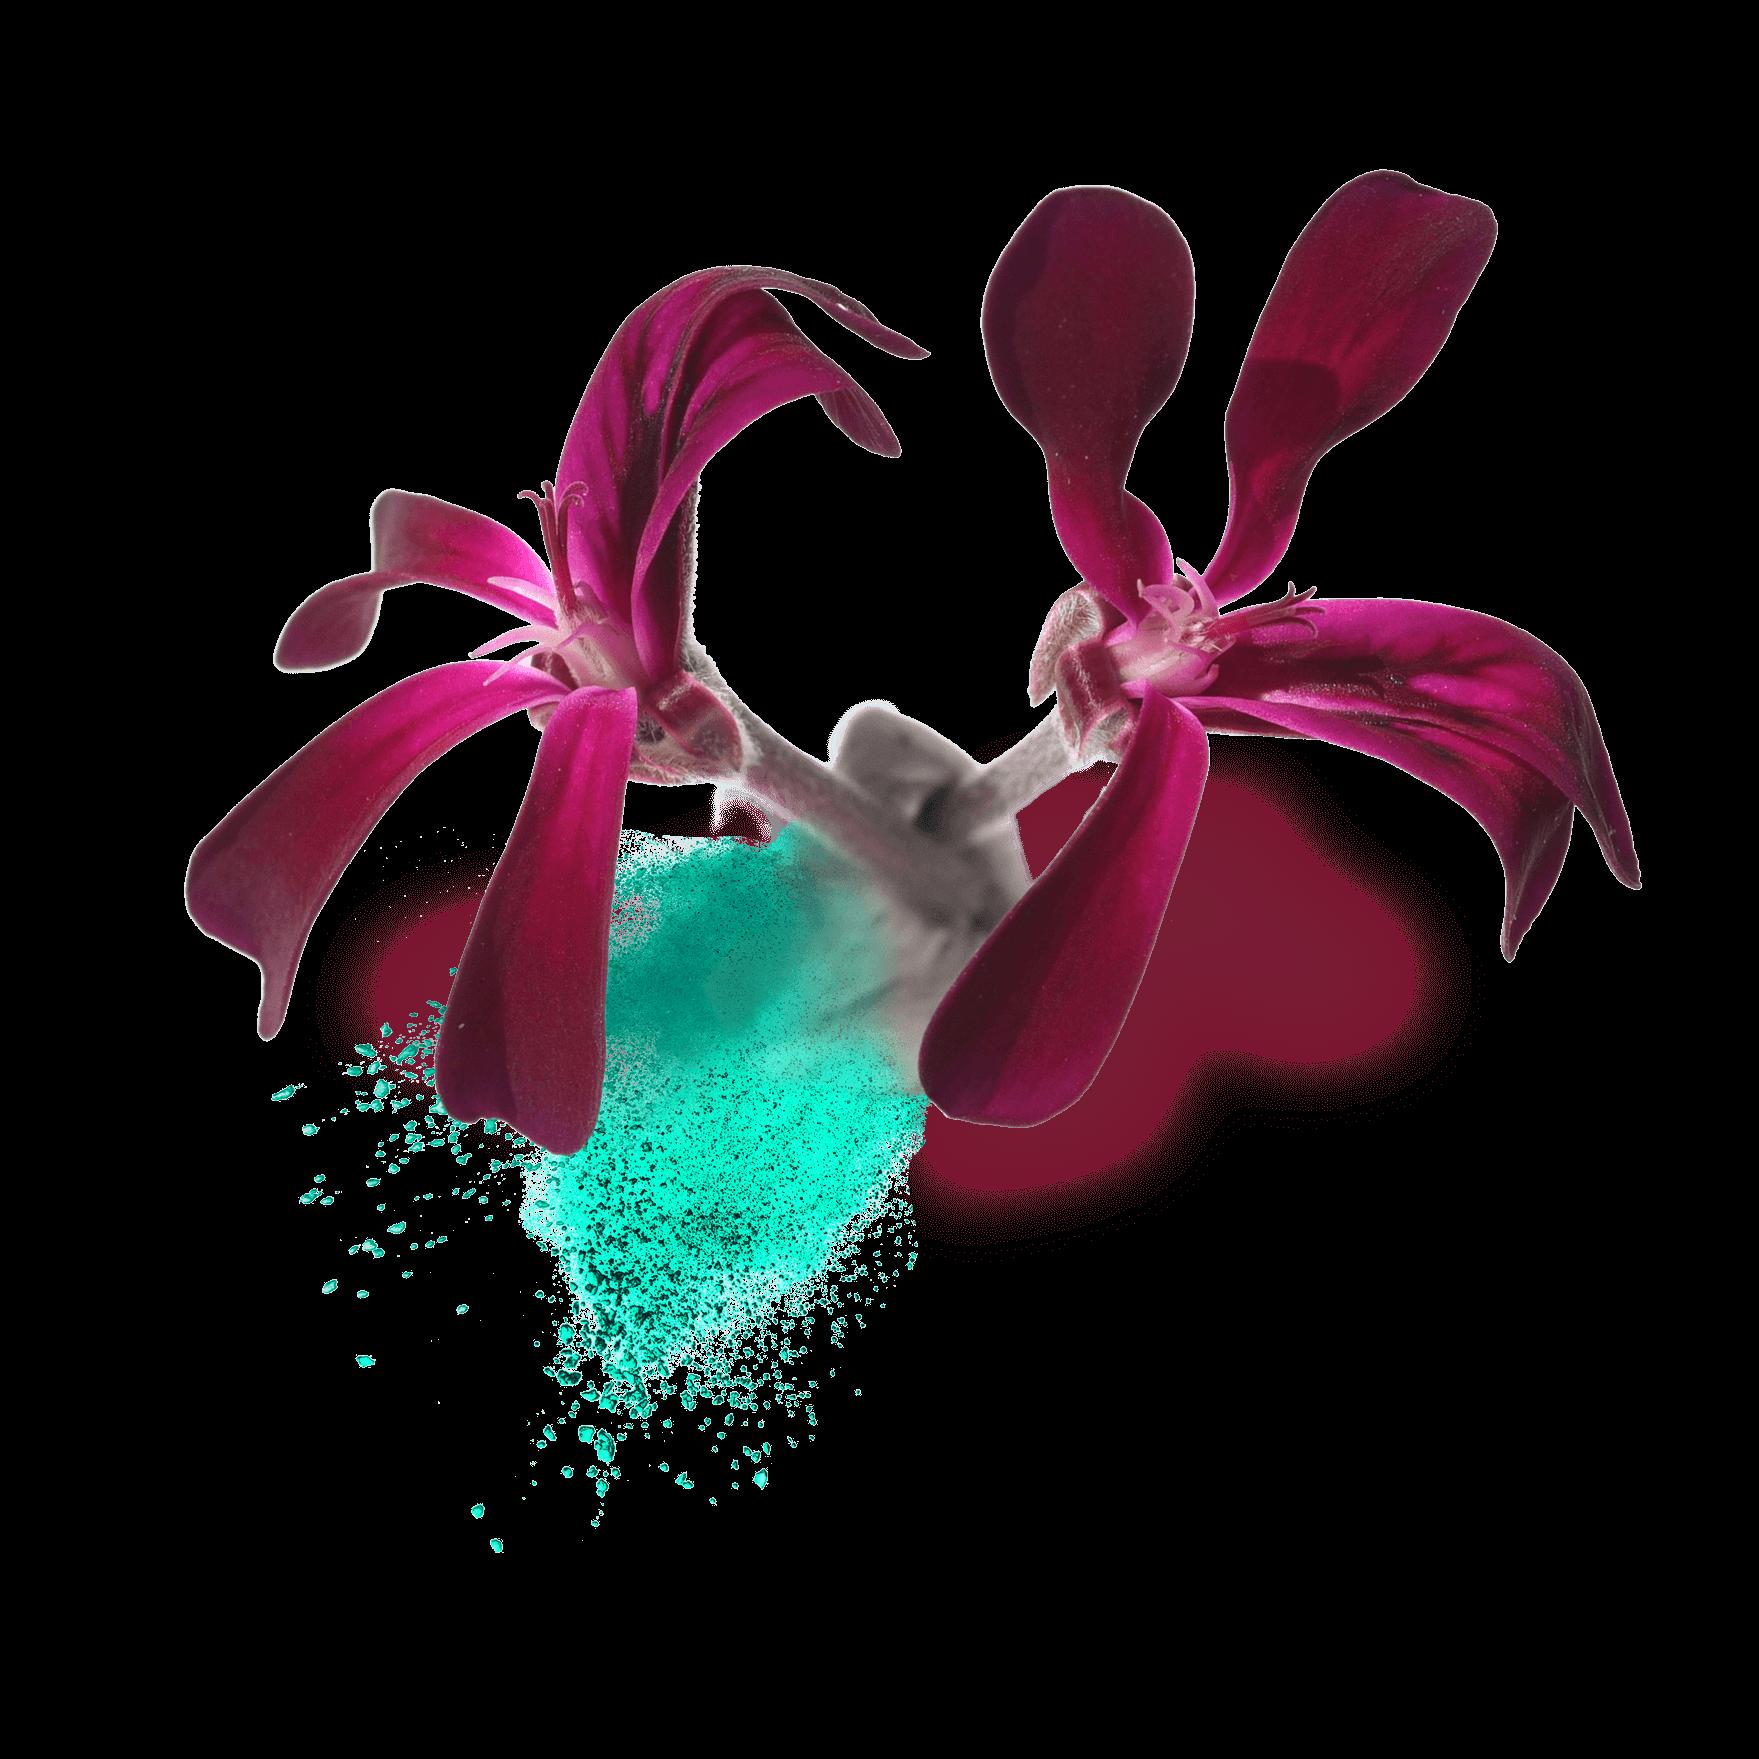 Pelargonium Extract